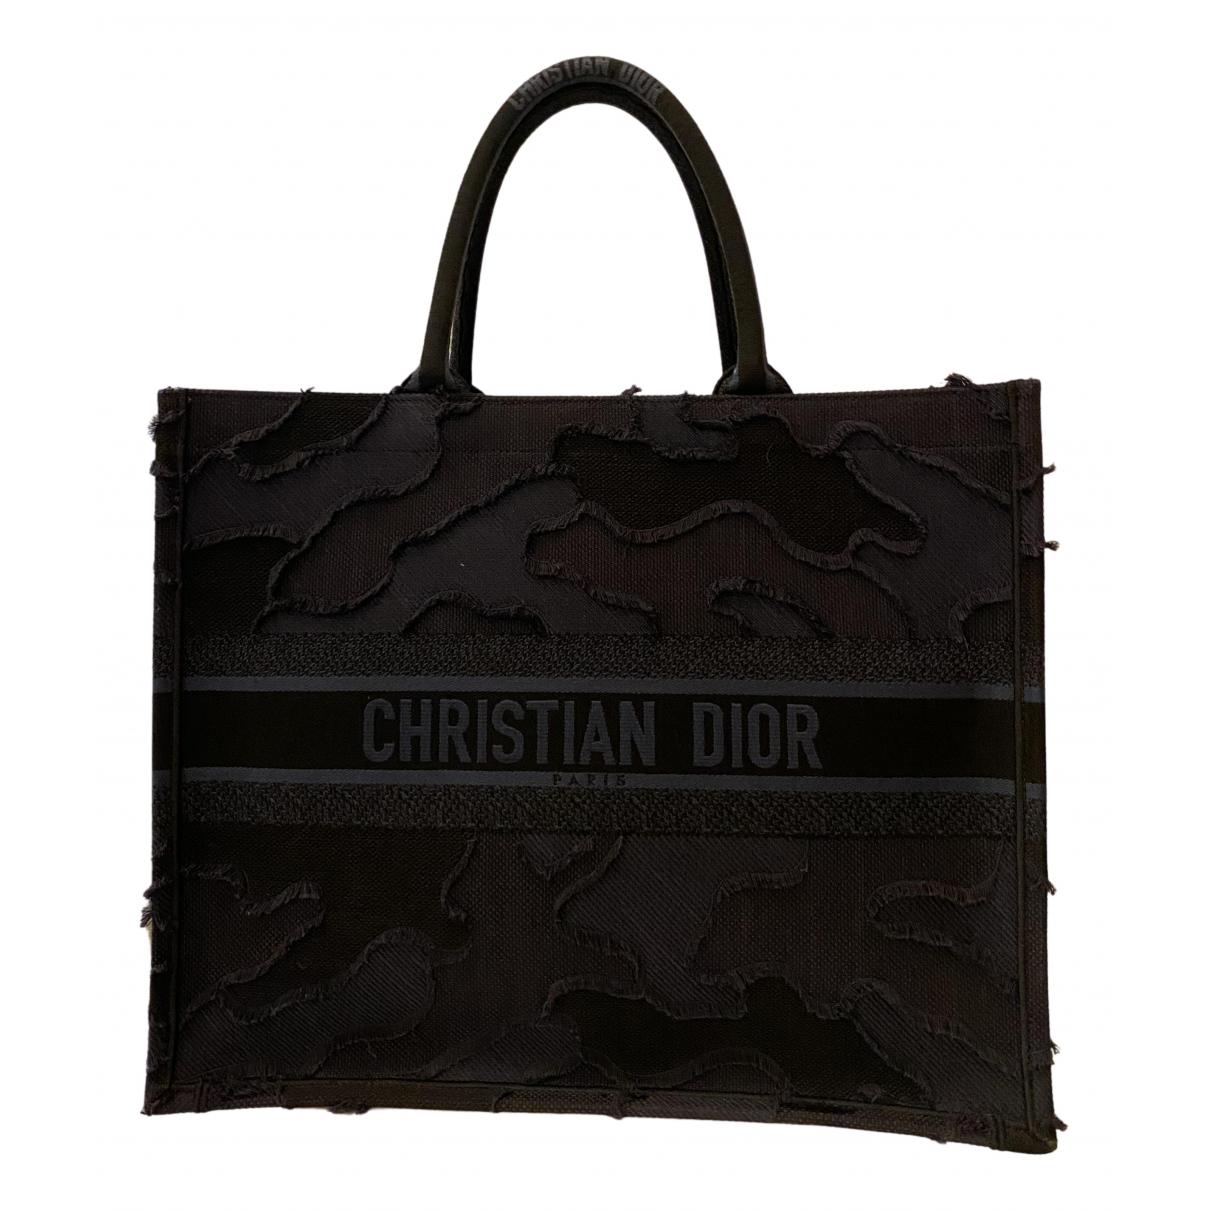 Dior Book Tote Navy Cloth handbag for Women N